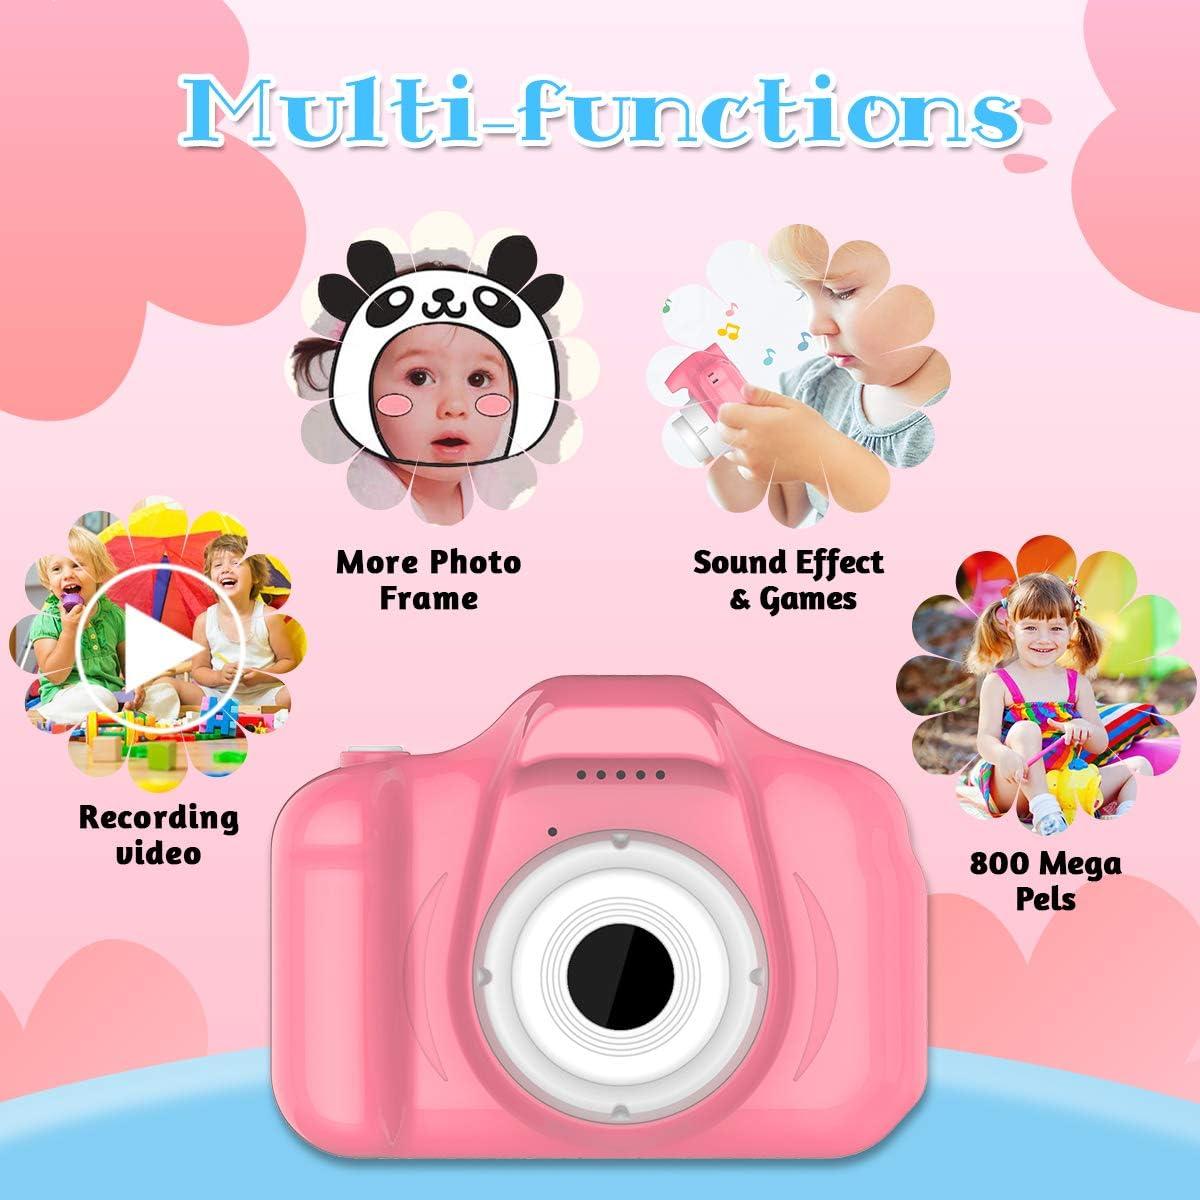 Jouets-3-6-Ans-Fille-YORKOO-Appareil-Photo-Enfant-HD1080P-Appareil-Photo-Rose miniature 2